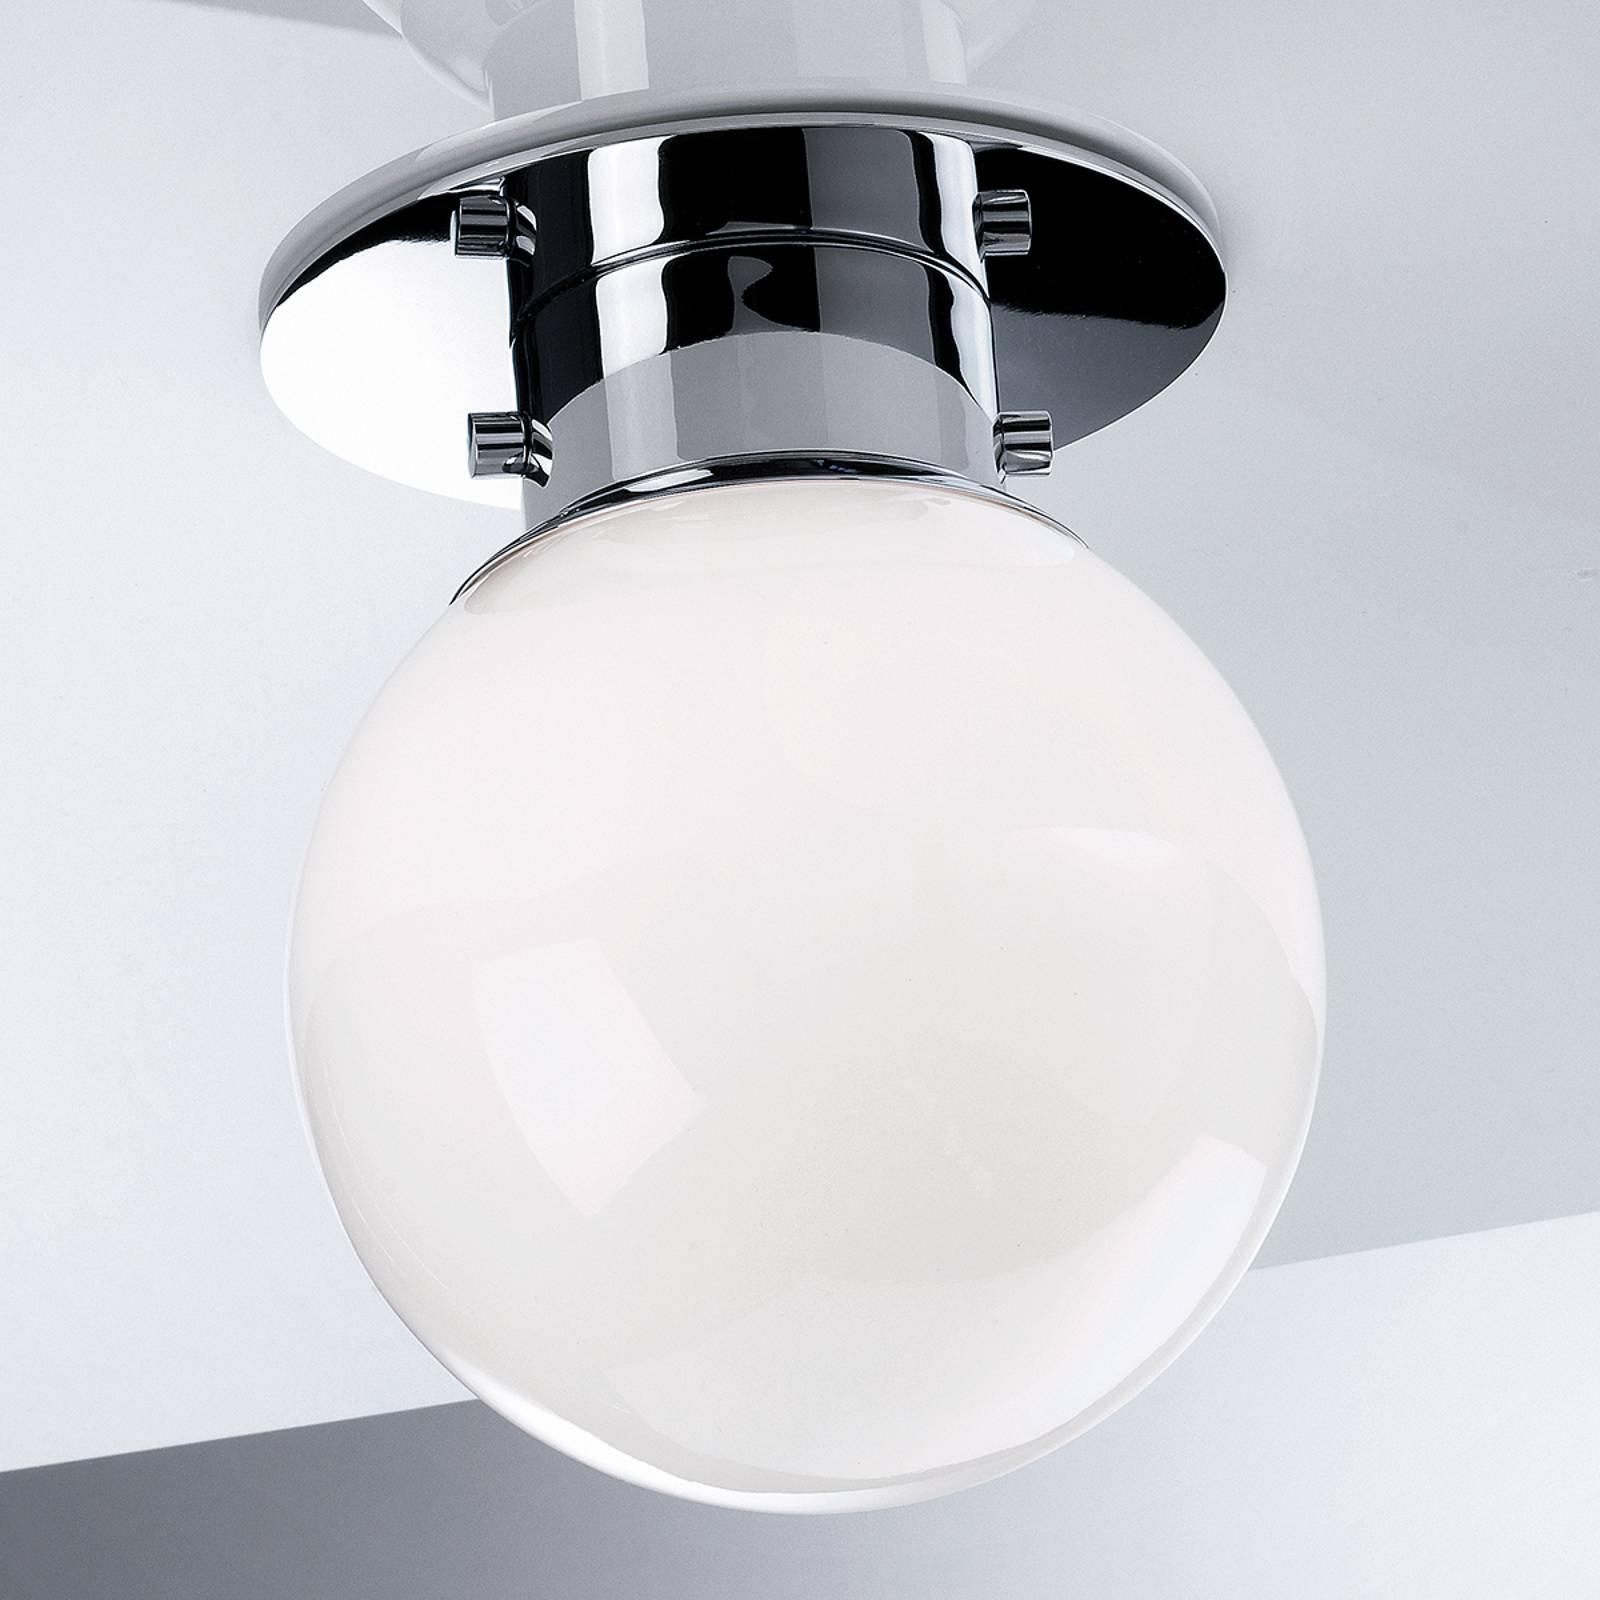 Decor Walther Globe 20 taklampe, krom